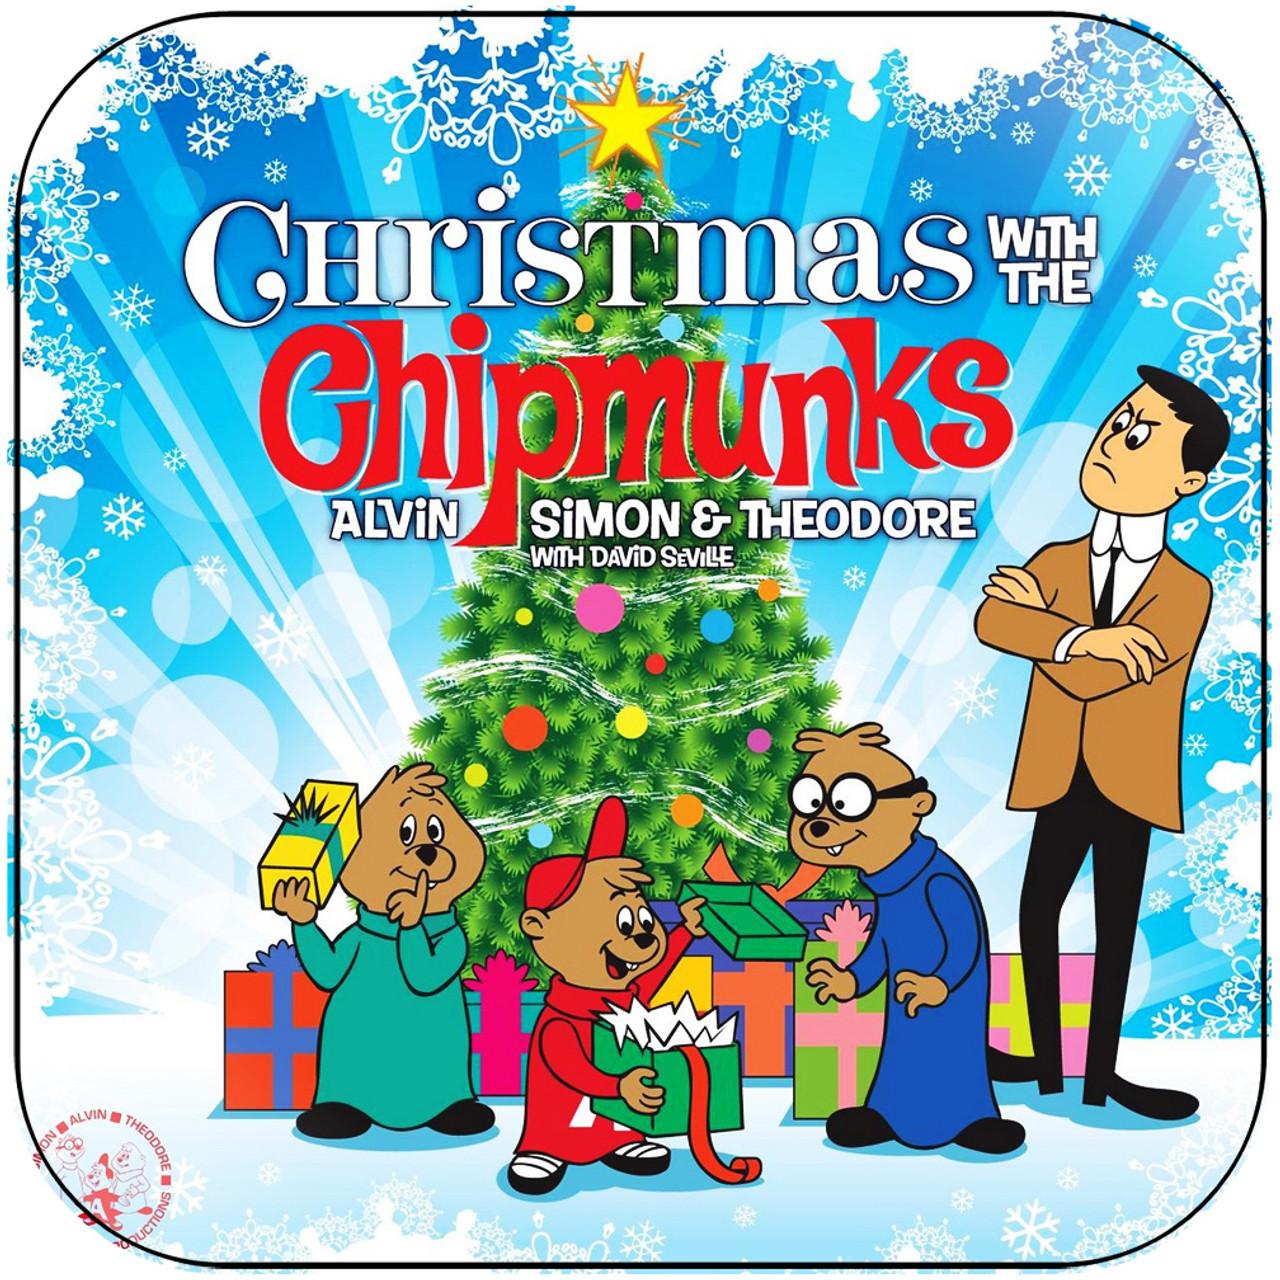 Chipmunks Christmas.The Chipmunks Christmas With The Chipmunks 1 Album Cover Sticker Album Cover Sticker